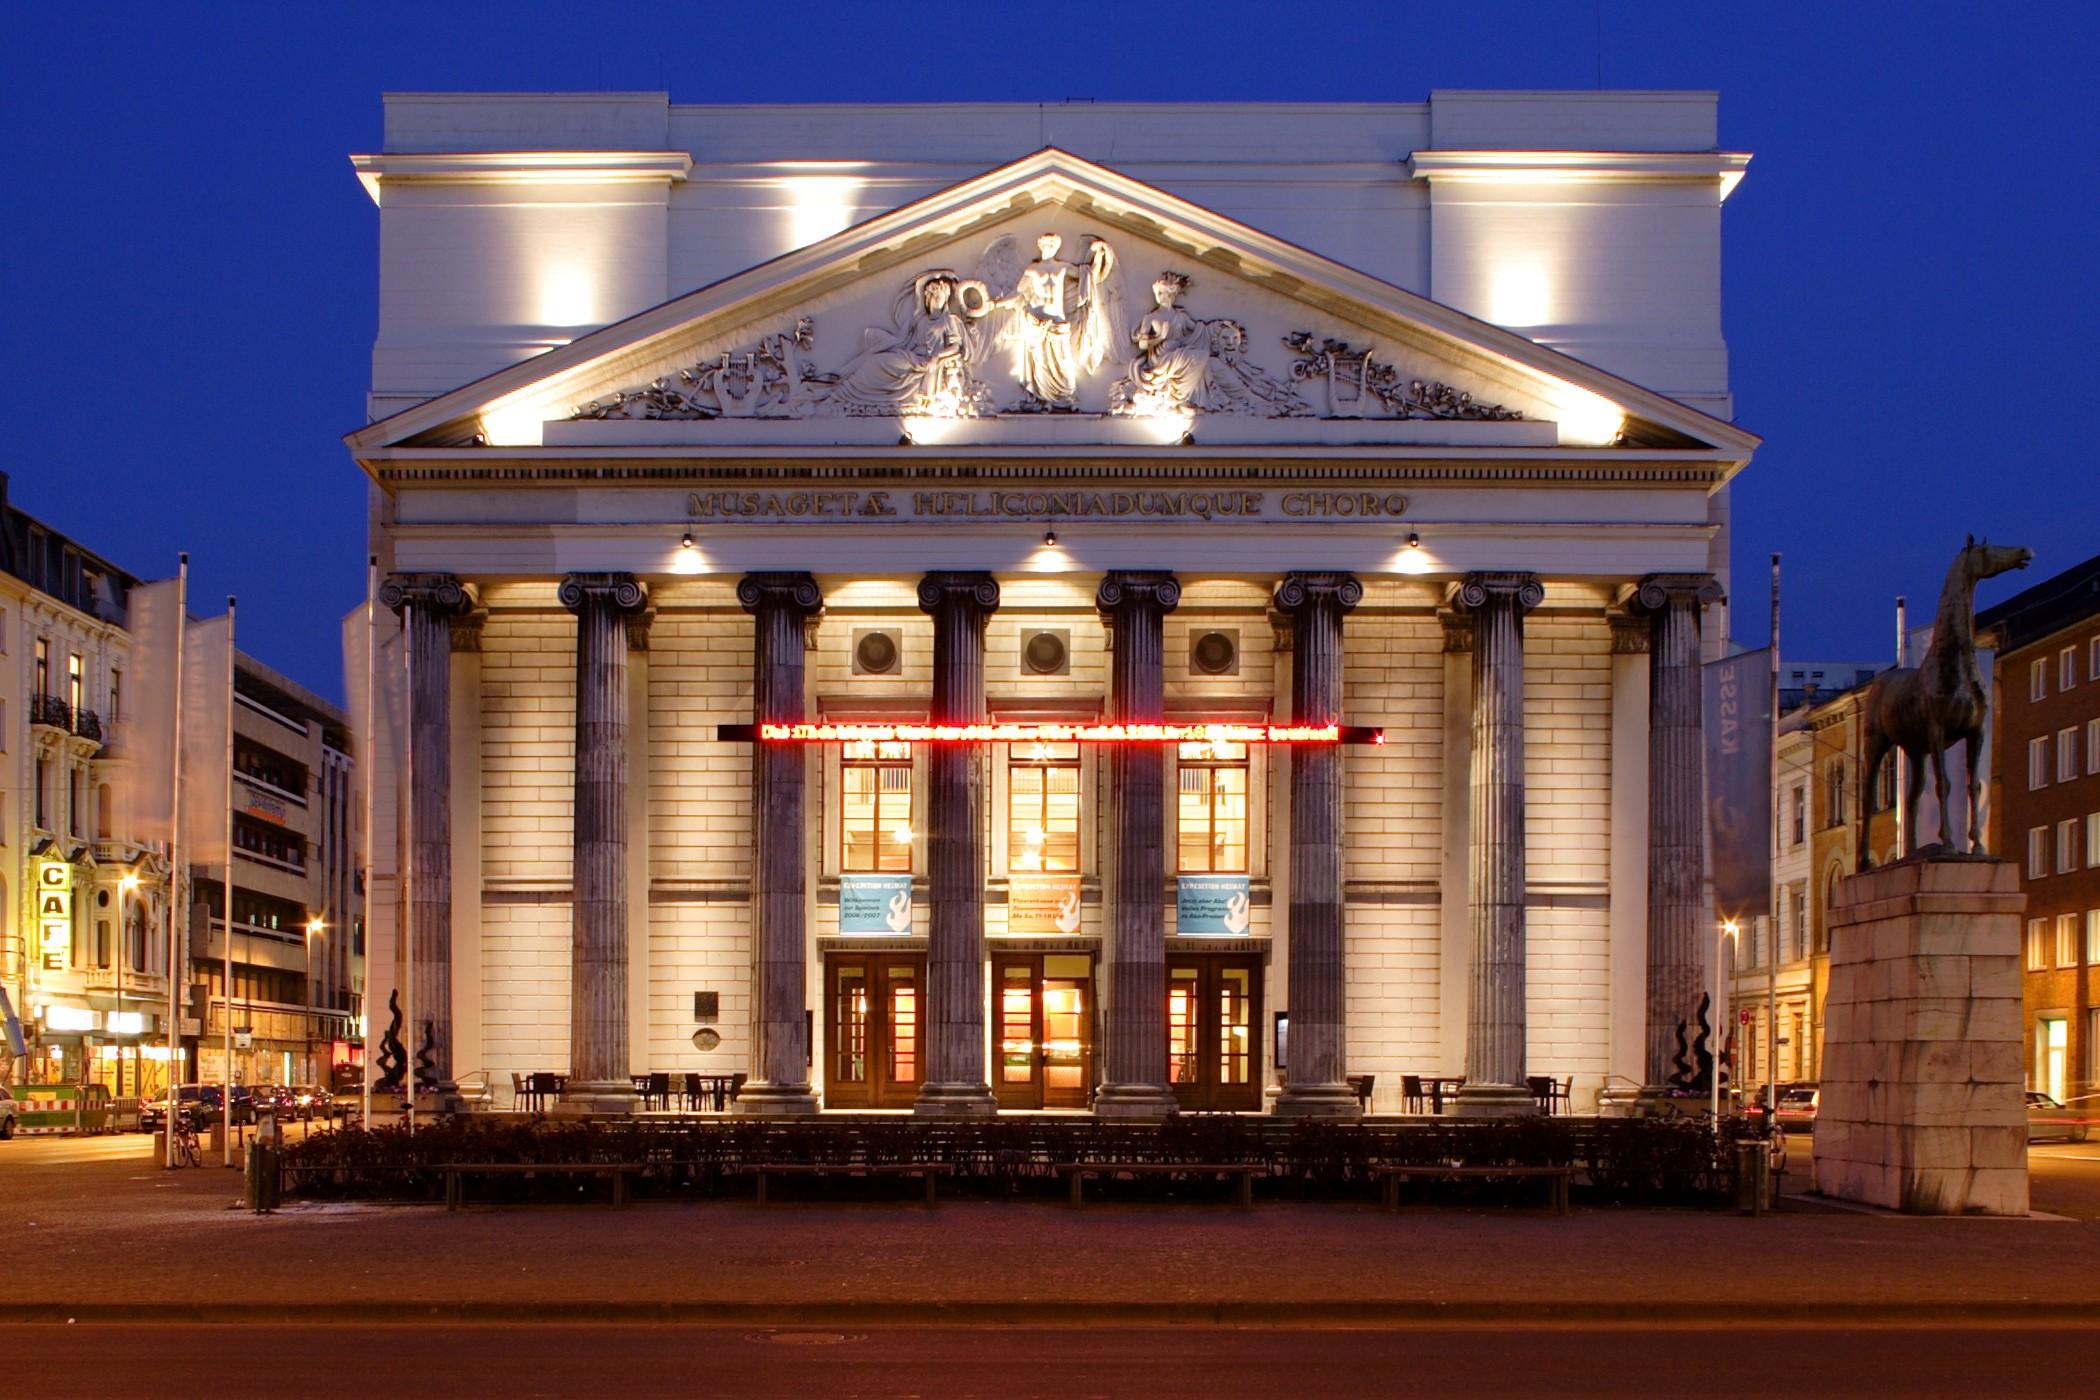 Autovermietung in Aachen - Theater